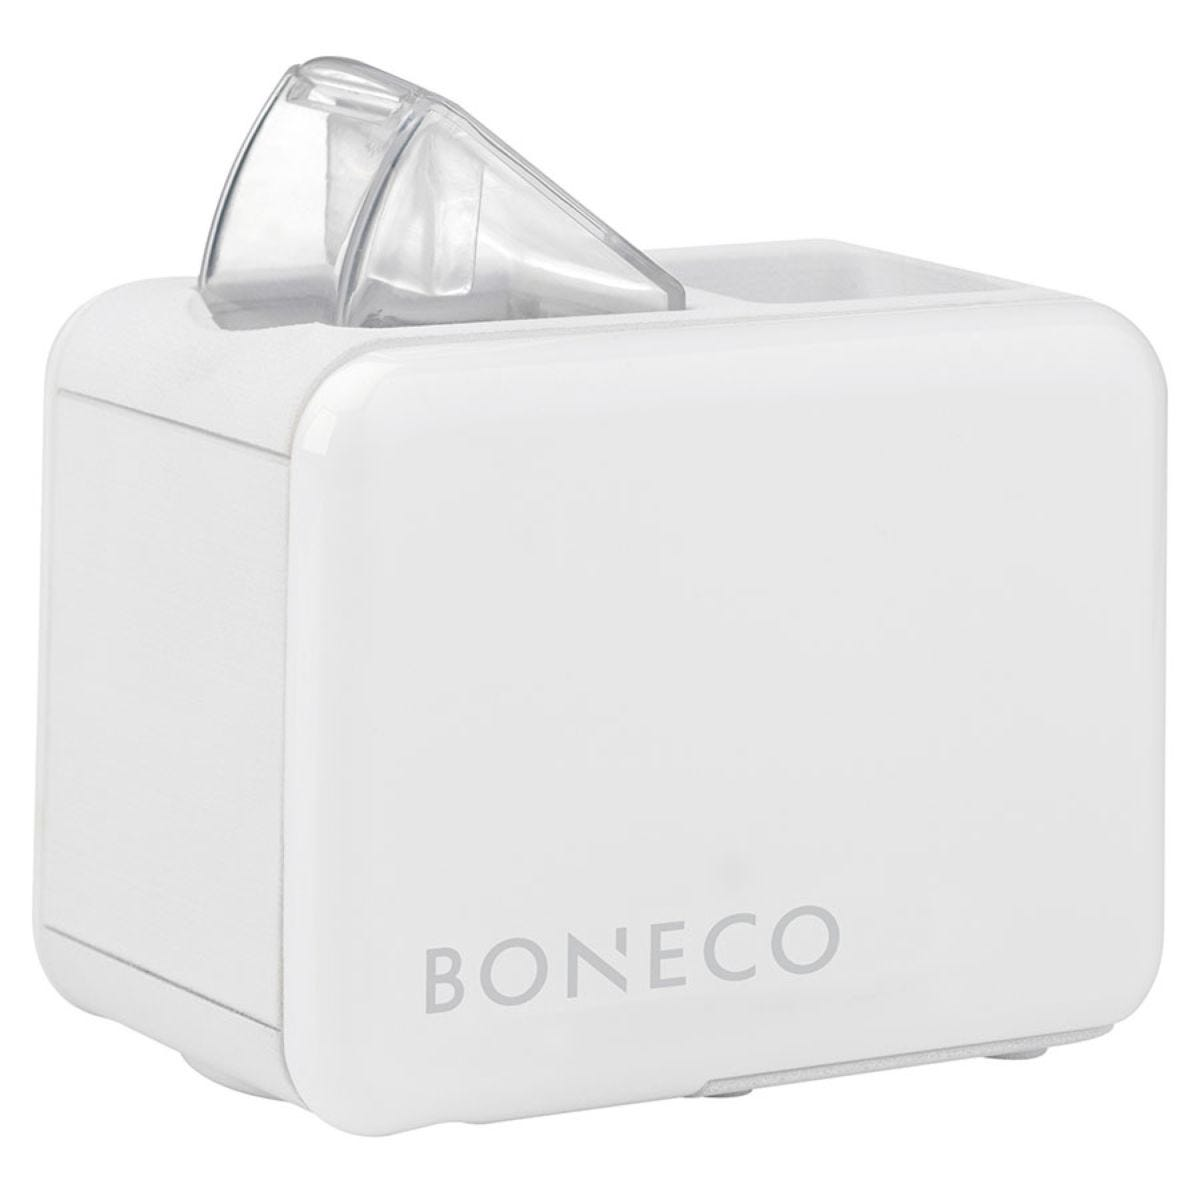 BONECO Humidifier Reviews